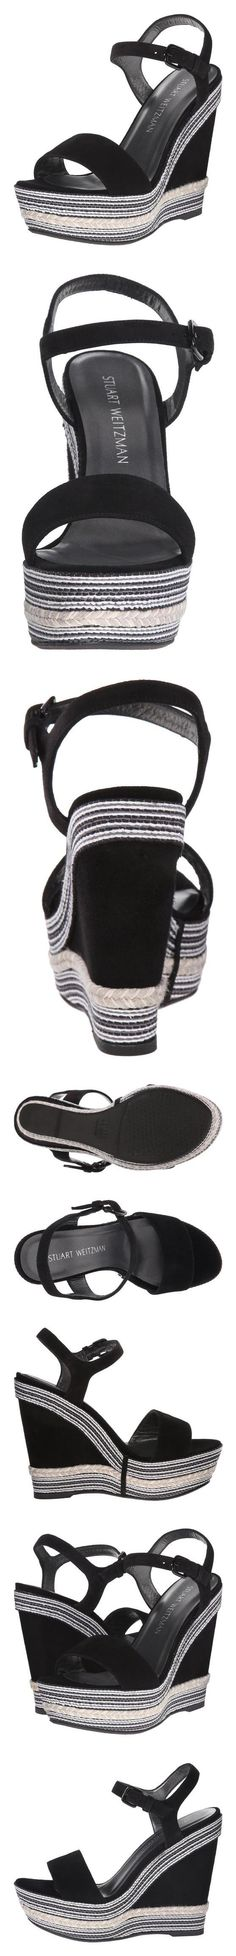 $435 - Stuart Weitzman Women's Single Wedge Sandal, Black, 10 M US #shoes #stuartweitzman #sandals